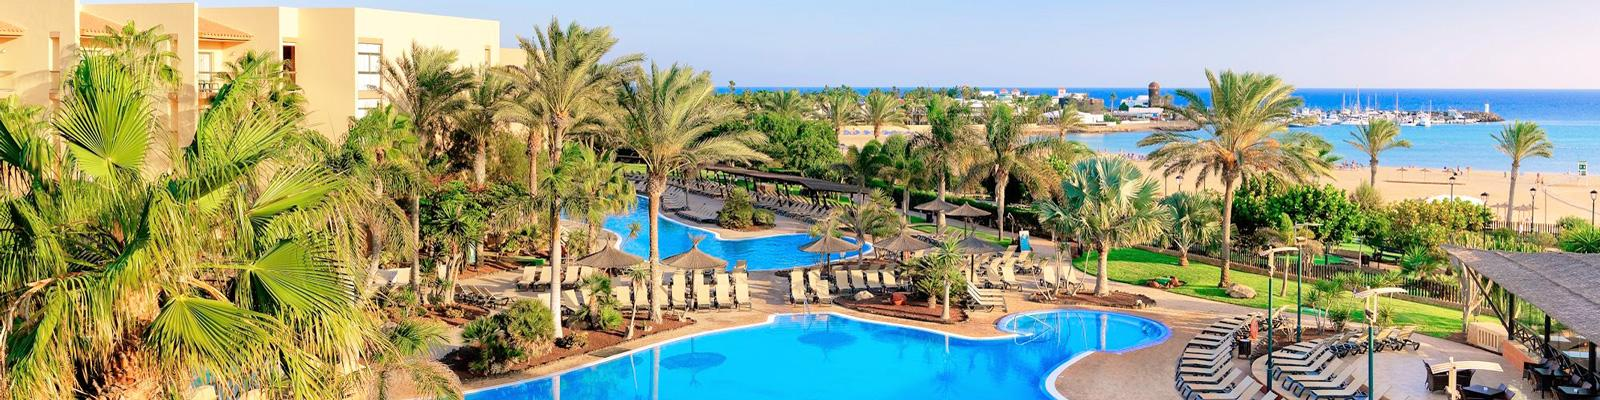 Barcelo Thalasso SPA - Hotel Fuerteventura